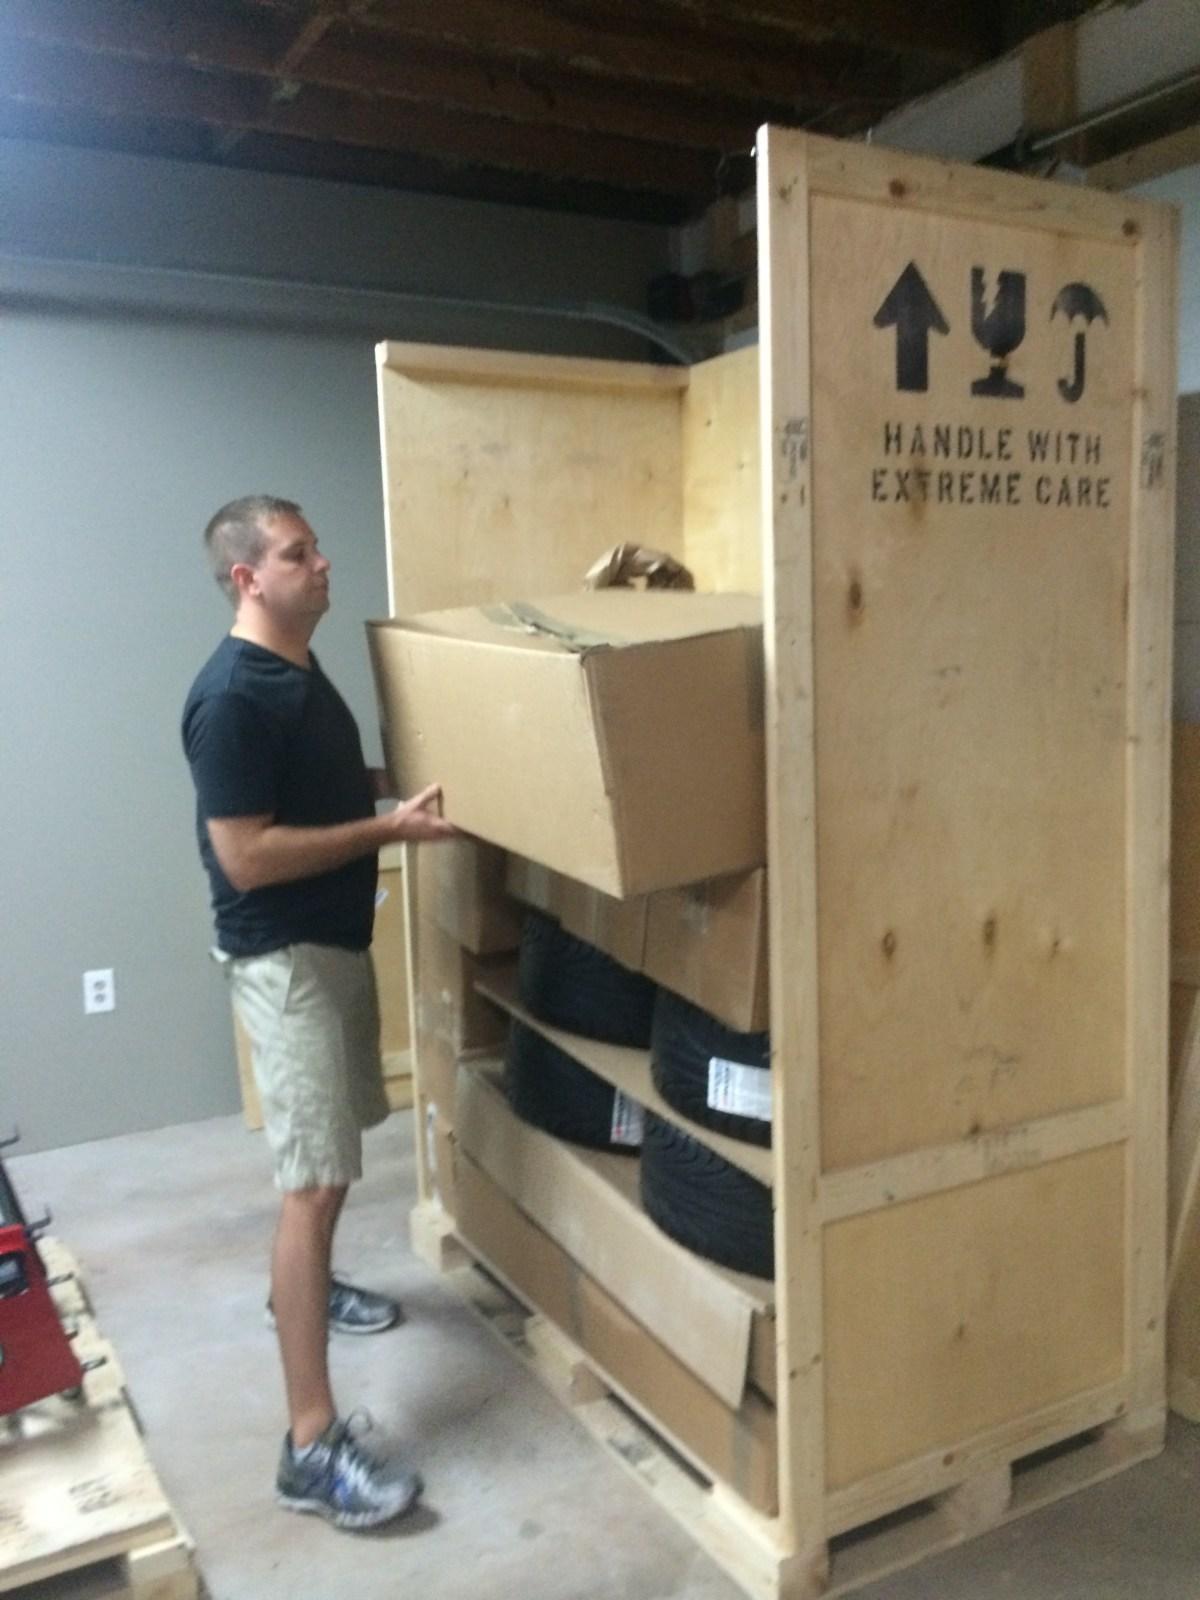 Unloading the tall box